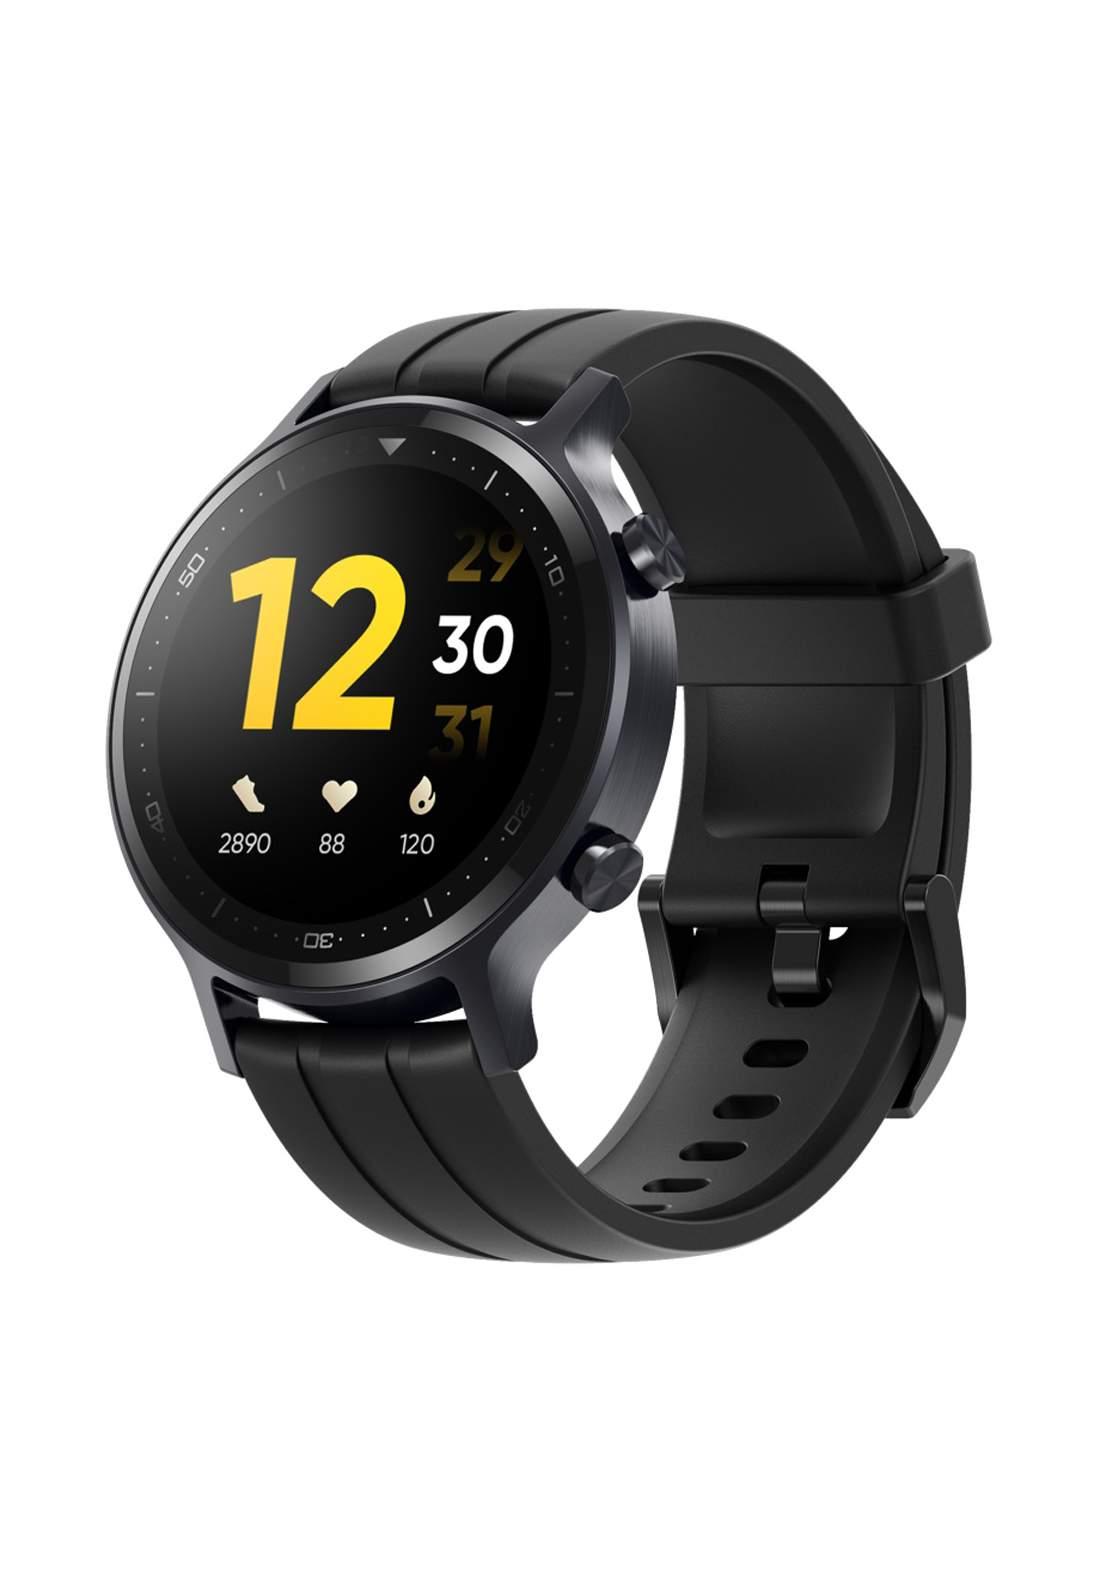 Realme Watch S Smart watch - Black ساعة ذكية